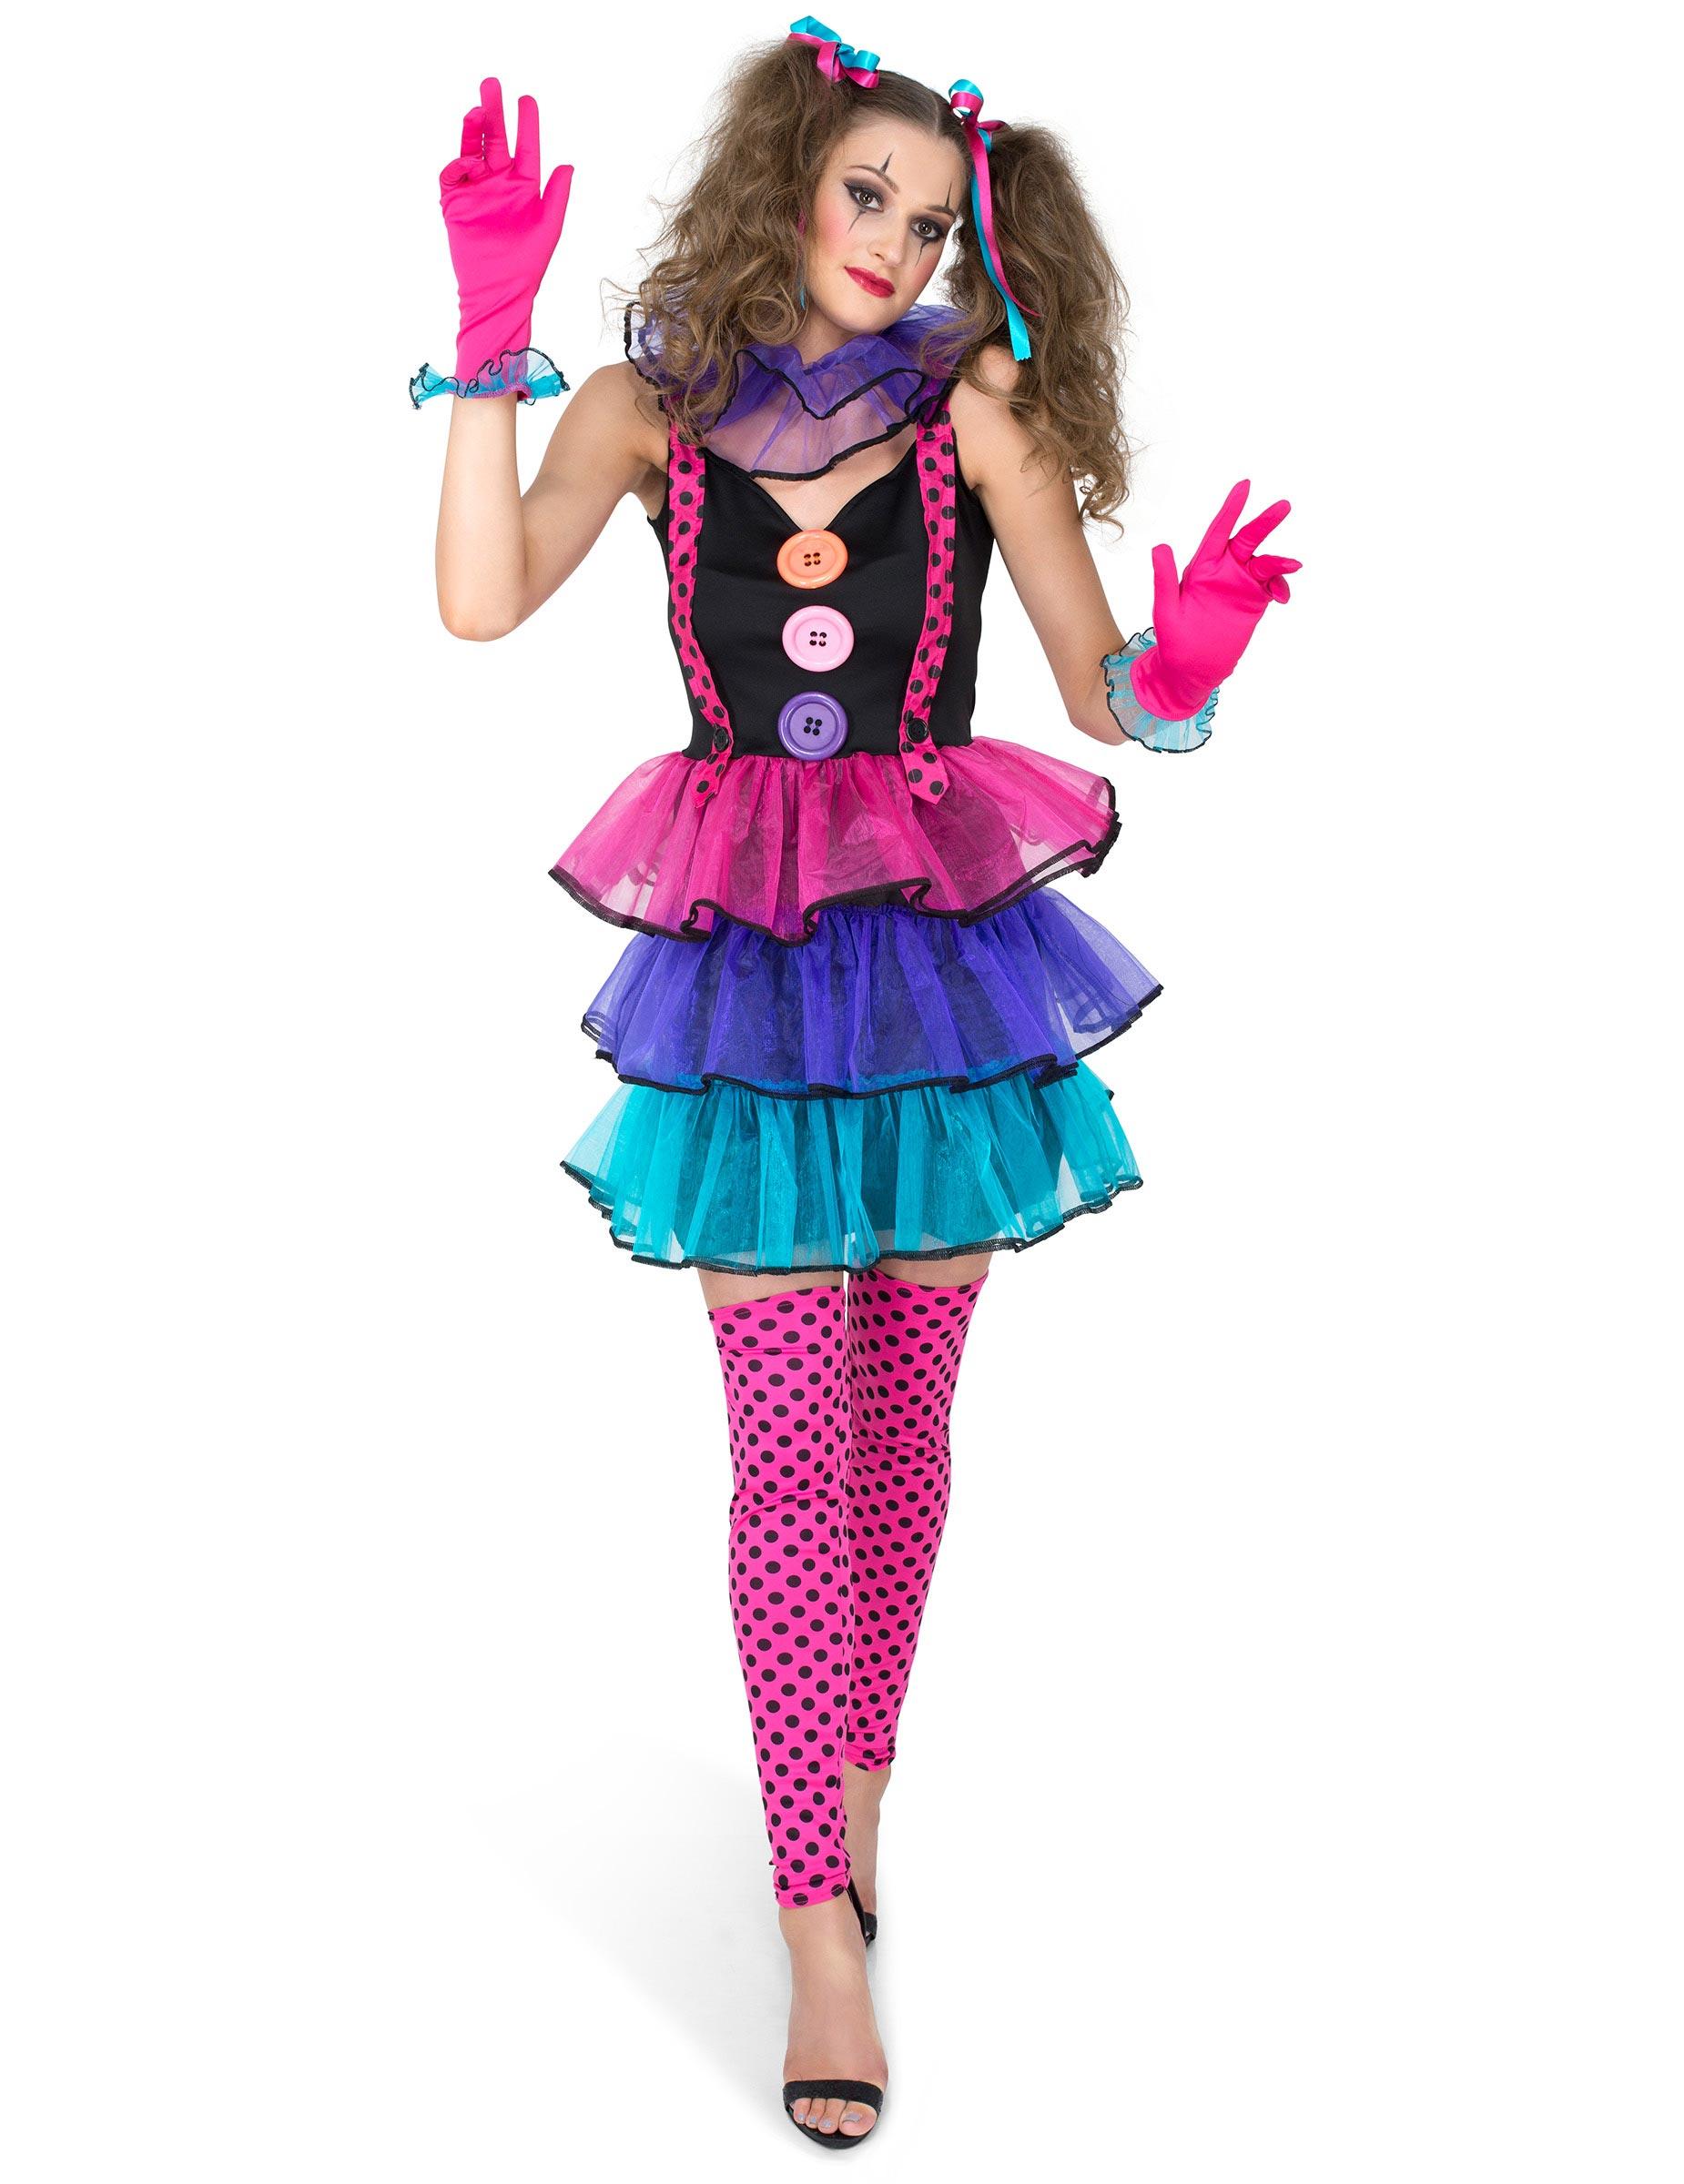 Carnavalskleding Dames Clown.Carnaval Clown Kostuum Voor Vrouwen Volwassenen Kostuums En